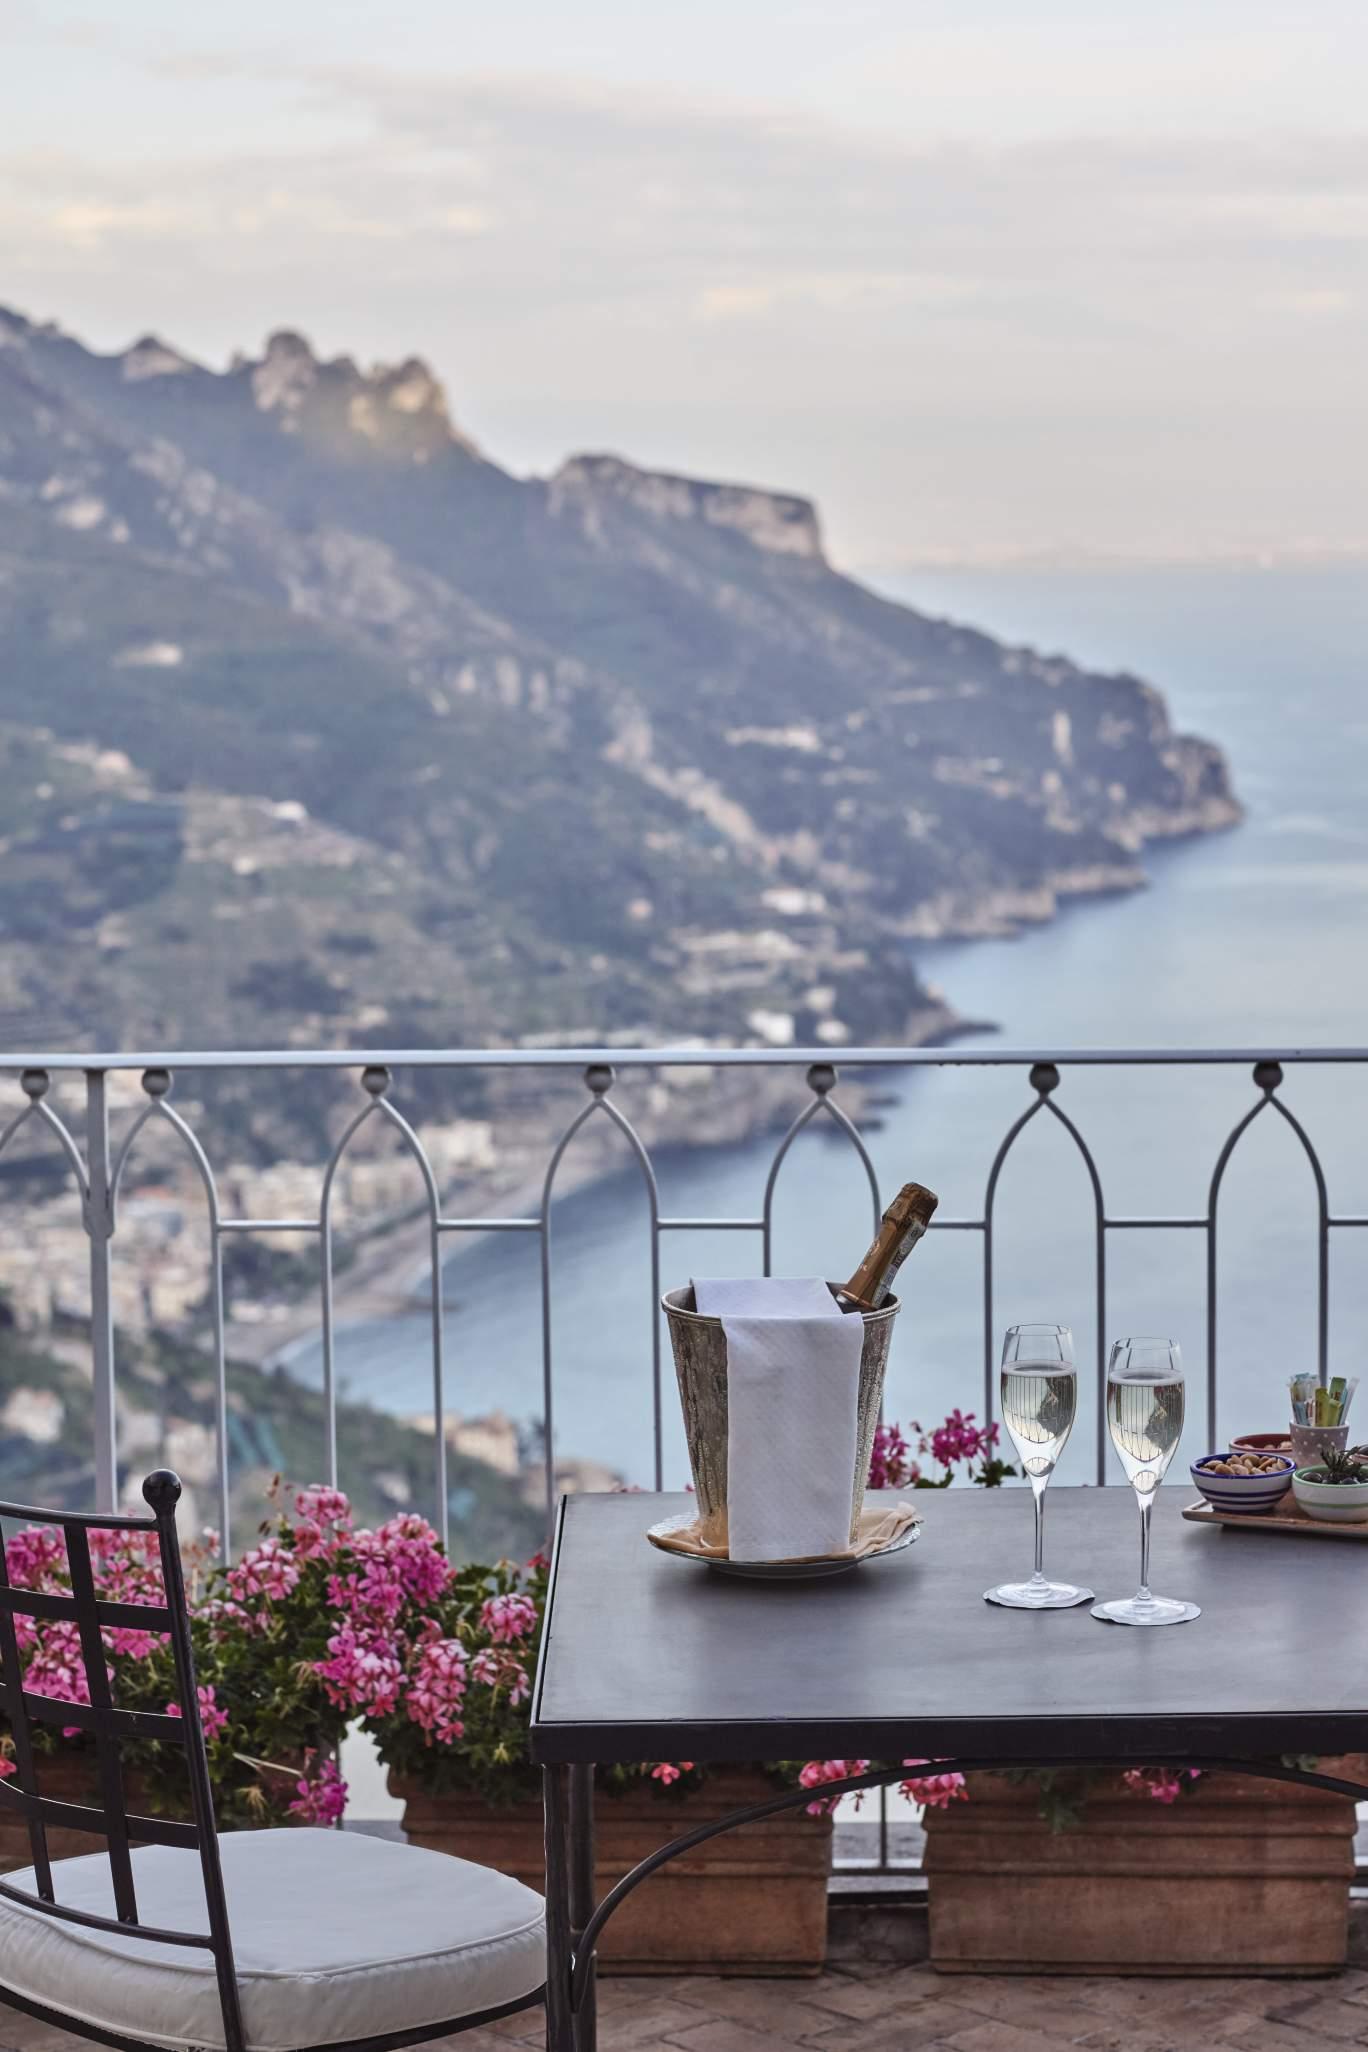 Belmond Hotel Caruso, Amalfi Coast, Italy.